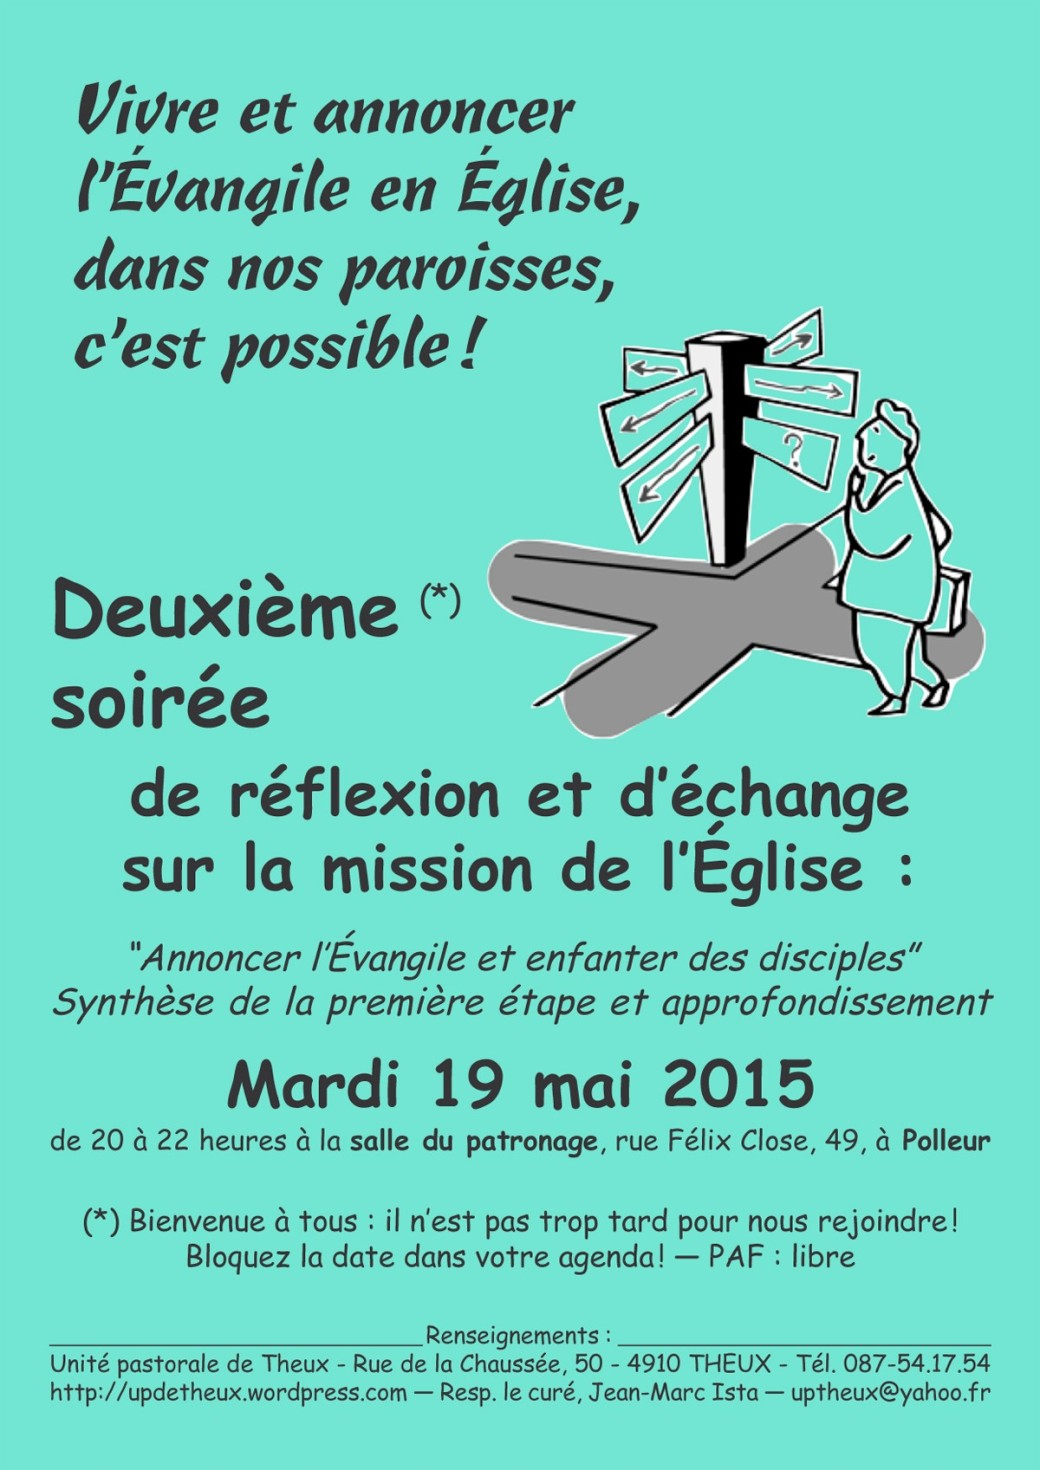 2015-05-19 - Mission UP 2fond